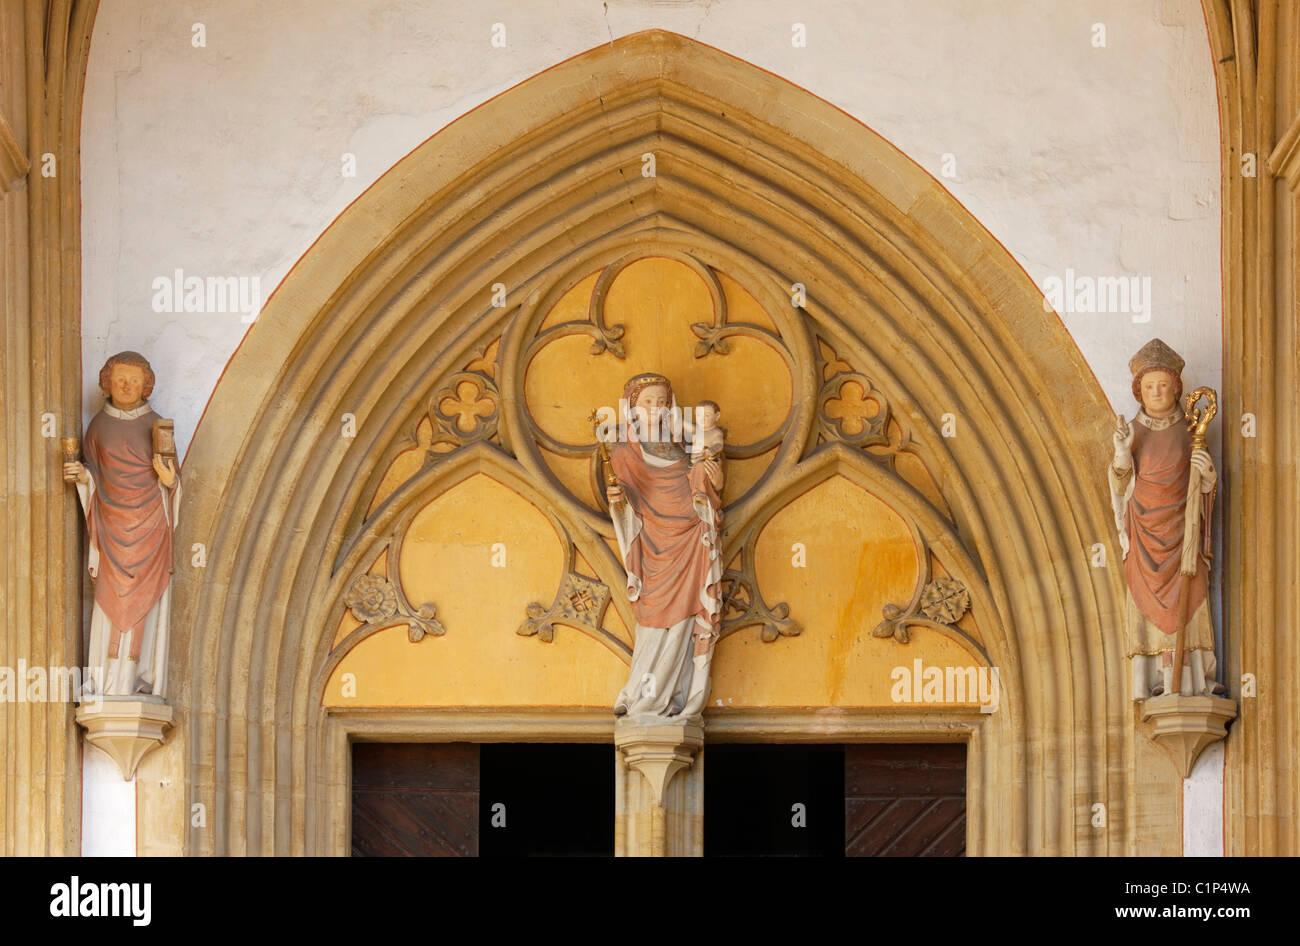 Münstermaifeld, Stiftskirche St. Martin und St. Severus - Stock Image